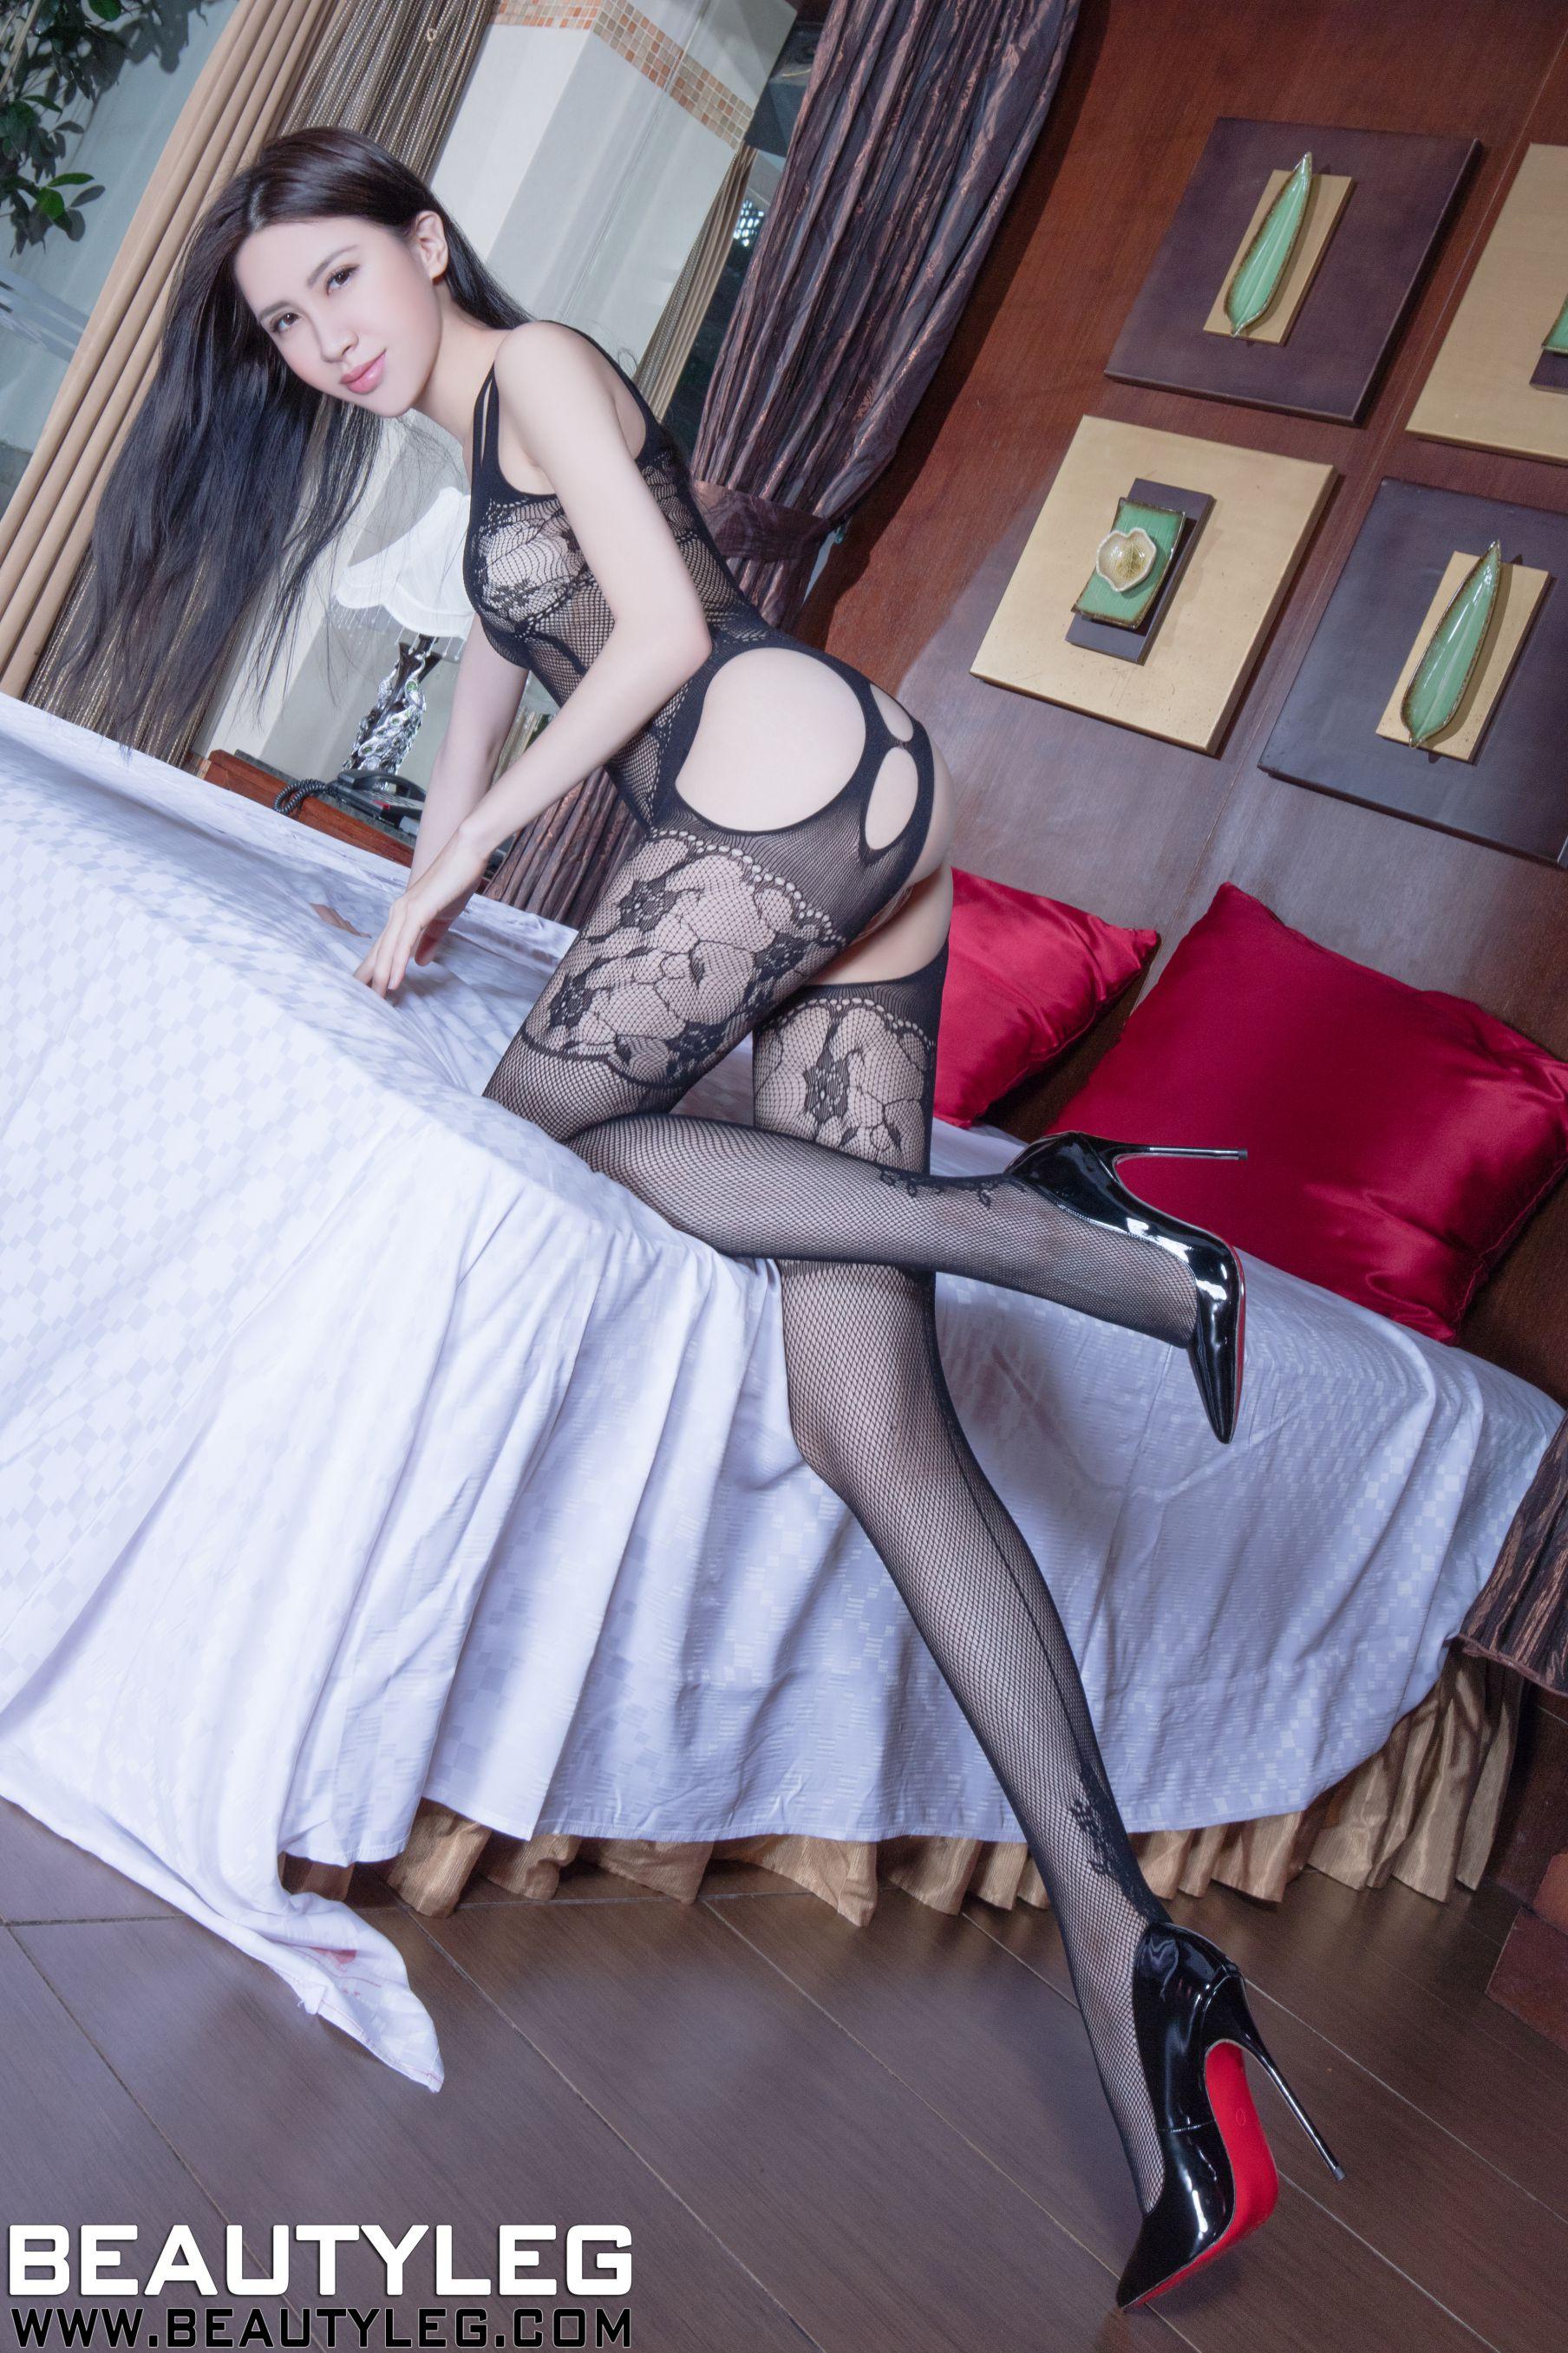 VOL.762 [Beautyleg]美腿灰丝:崔多朵(崔德蓉,腿模Stephy)高品质写真套图(41P)